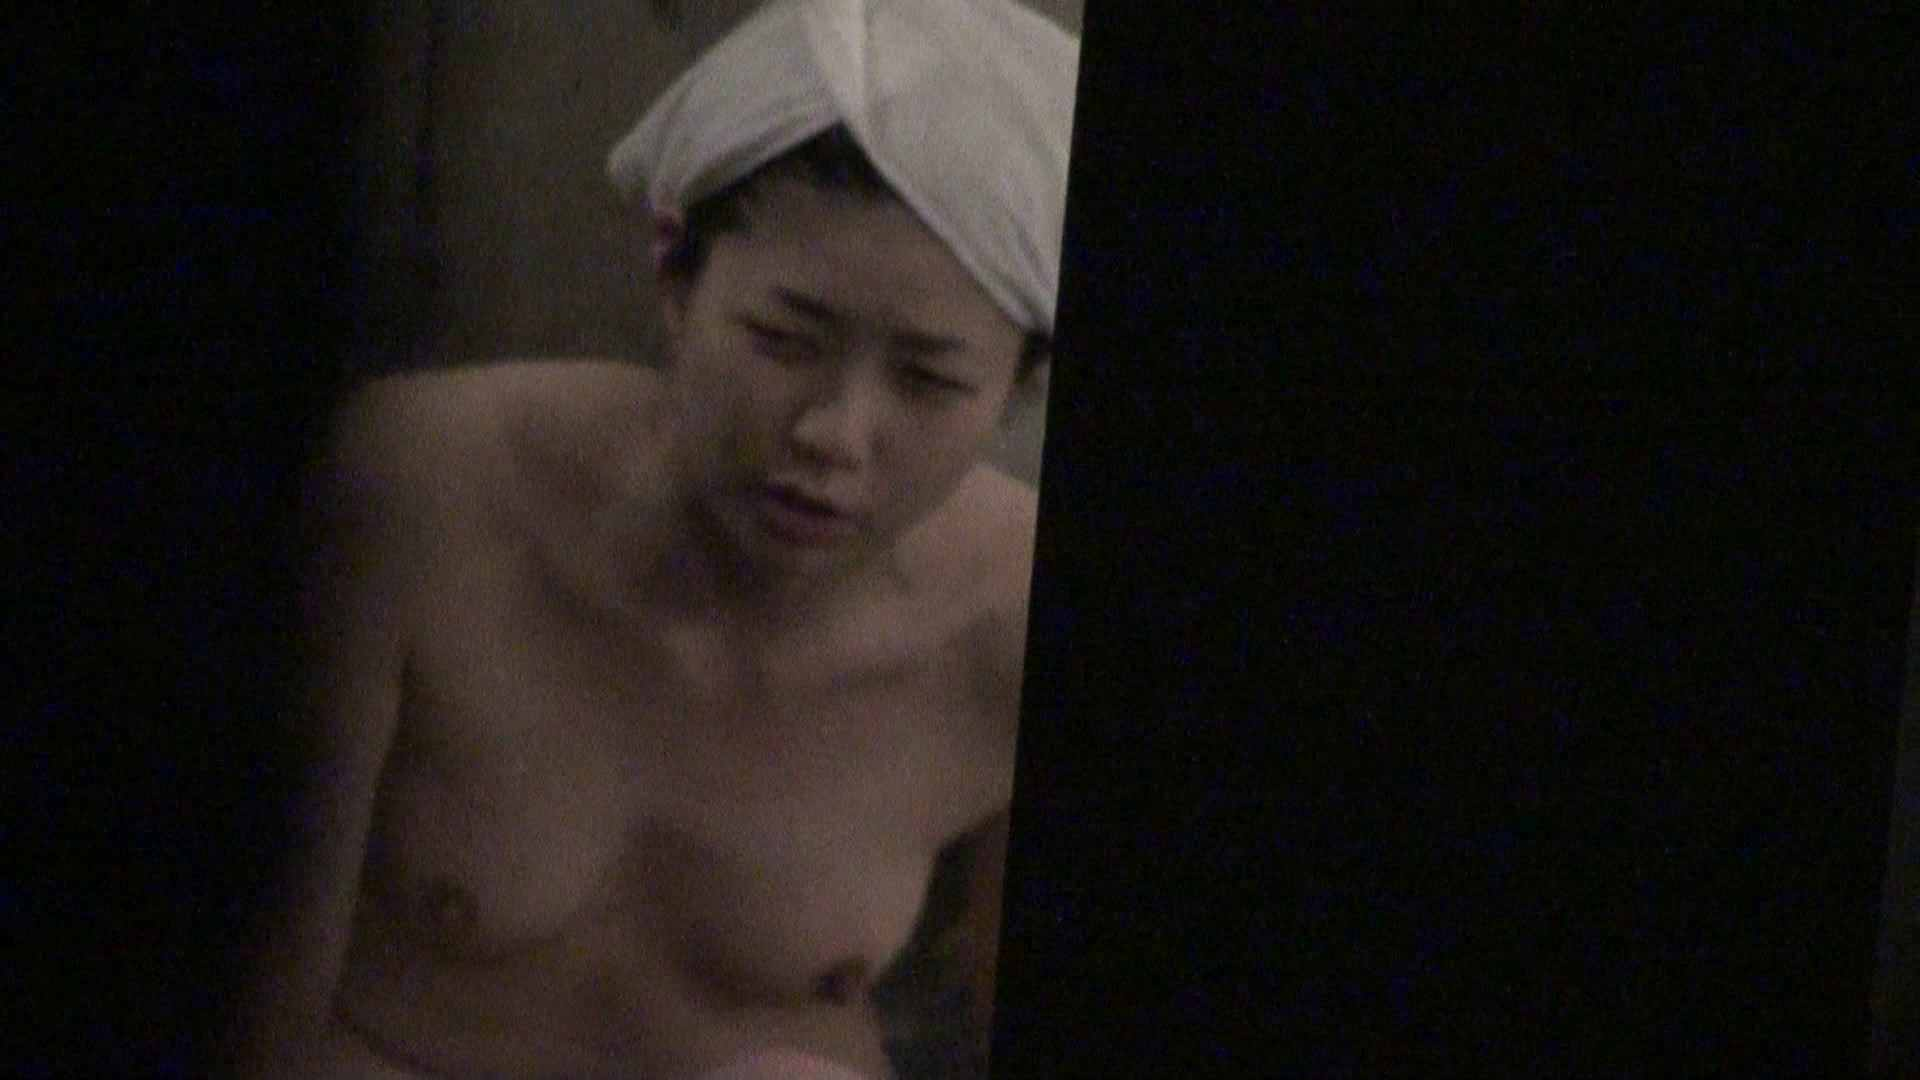 Aquaな露天風呂Vol.401 露天風呂 AV無料動画キャプチャ 108連発 74